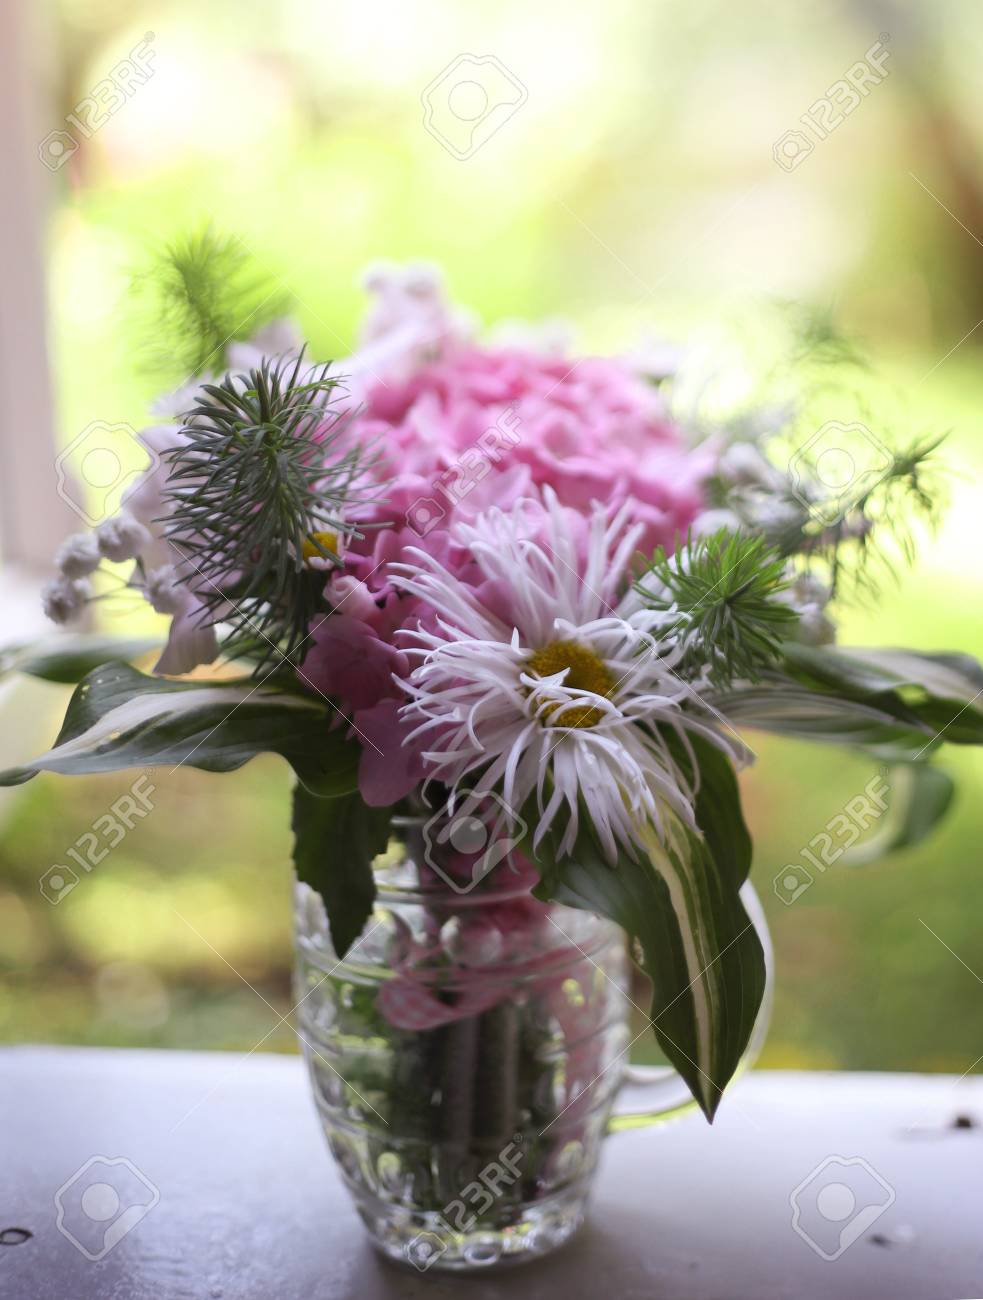 Cute Mini Hydrangea Bouquet In Beer Mug Stay On The Windowsill ...